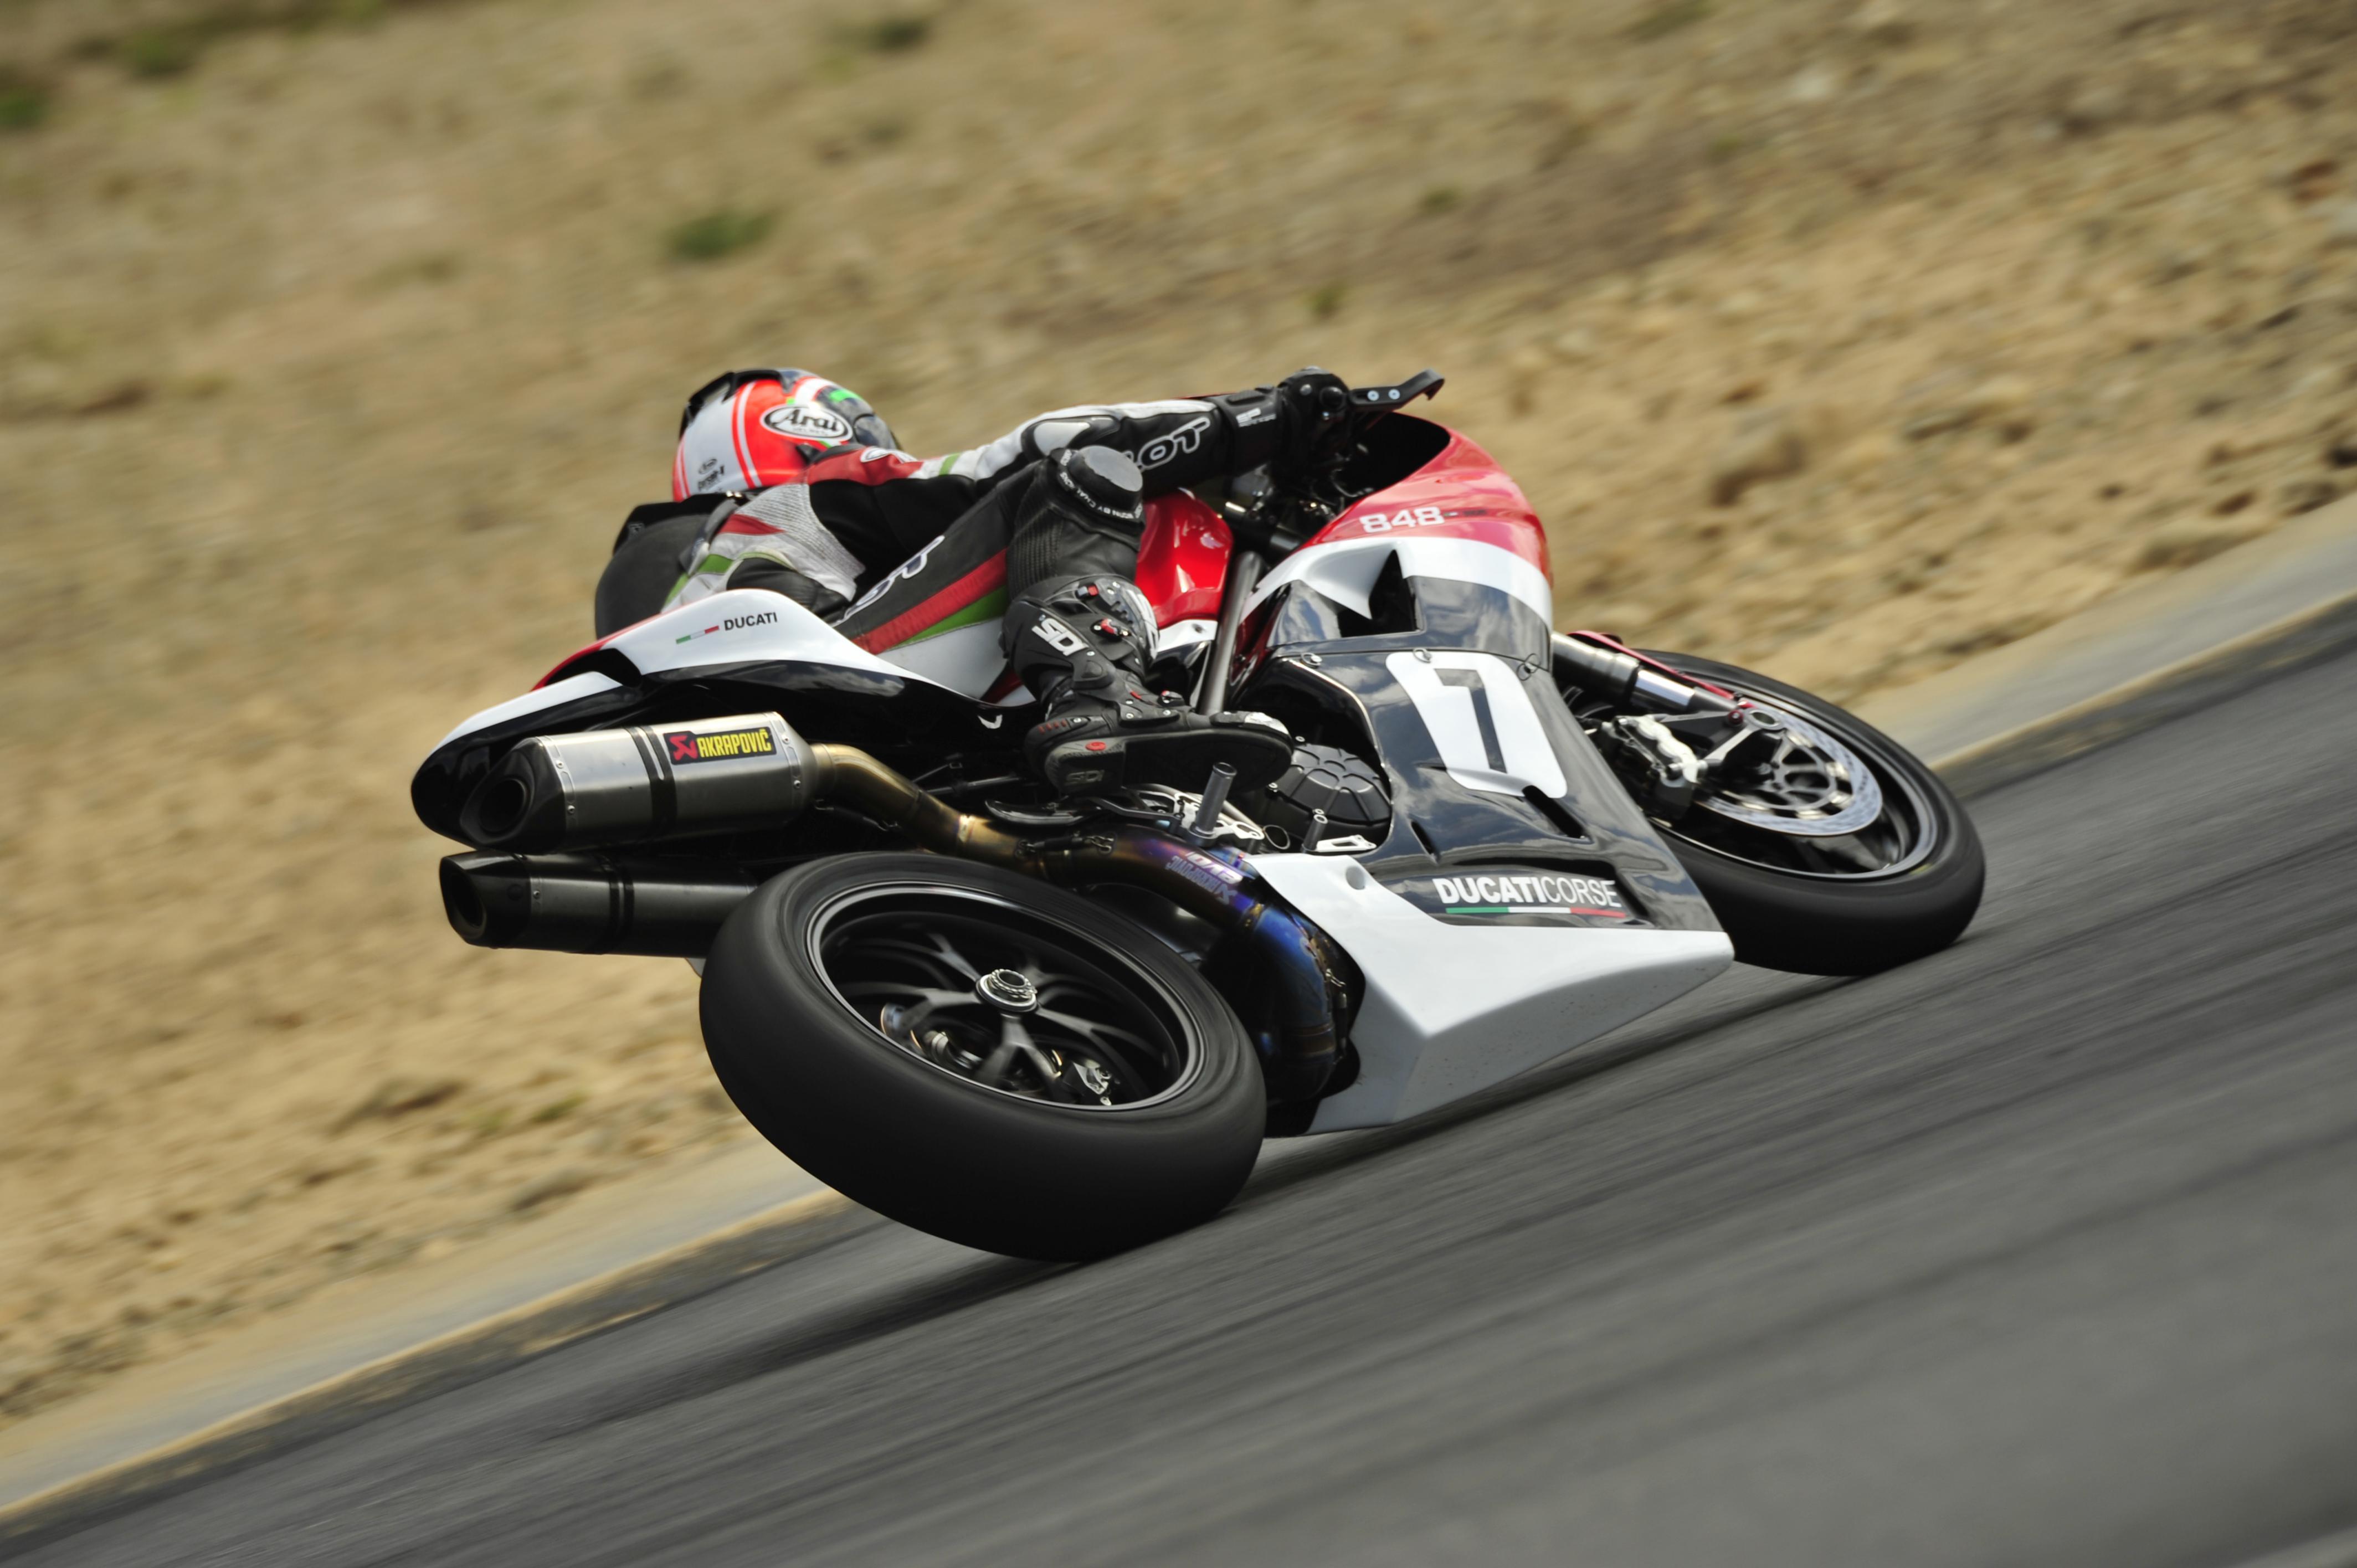 94 900SS custom rebuild - Ducati.ms - The Ultimate Ducati